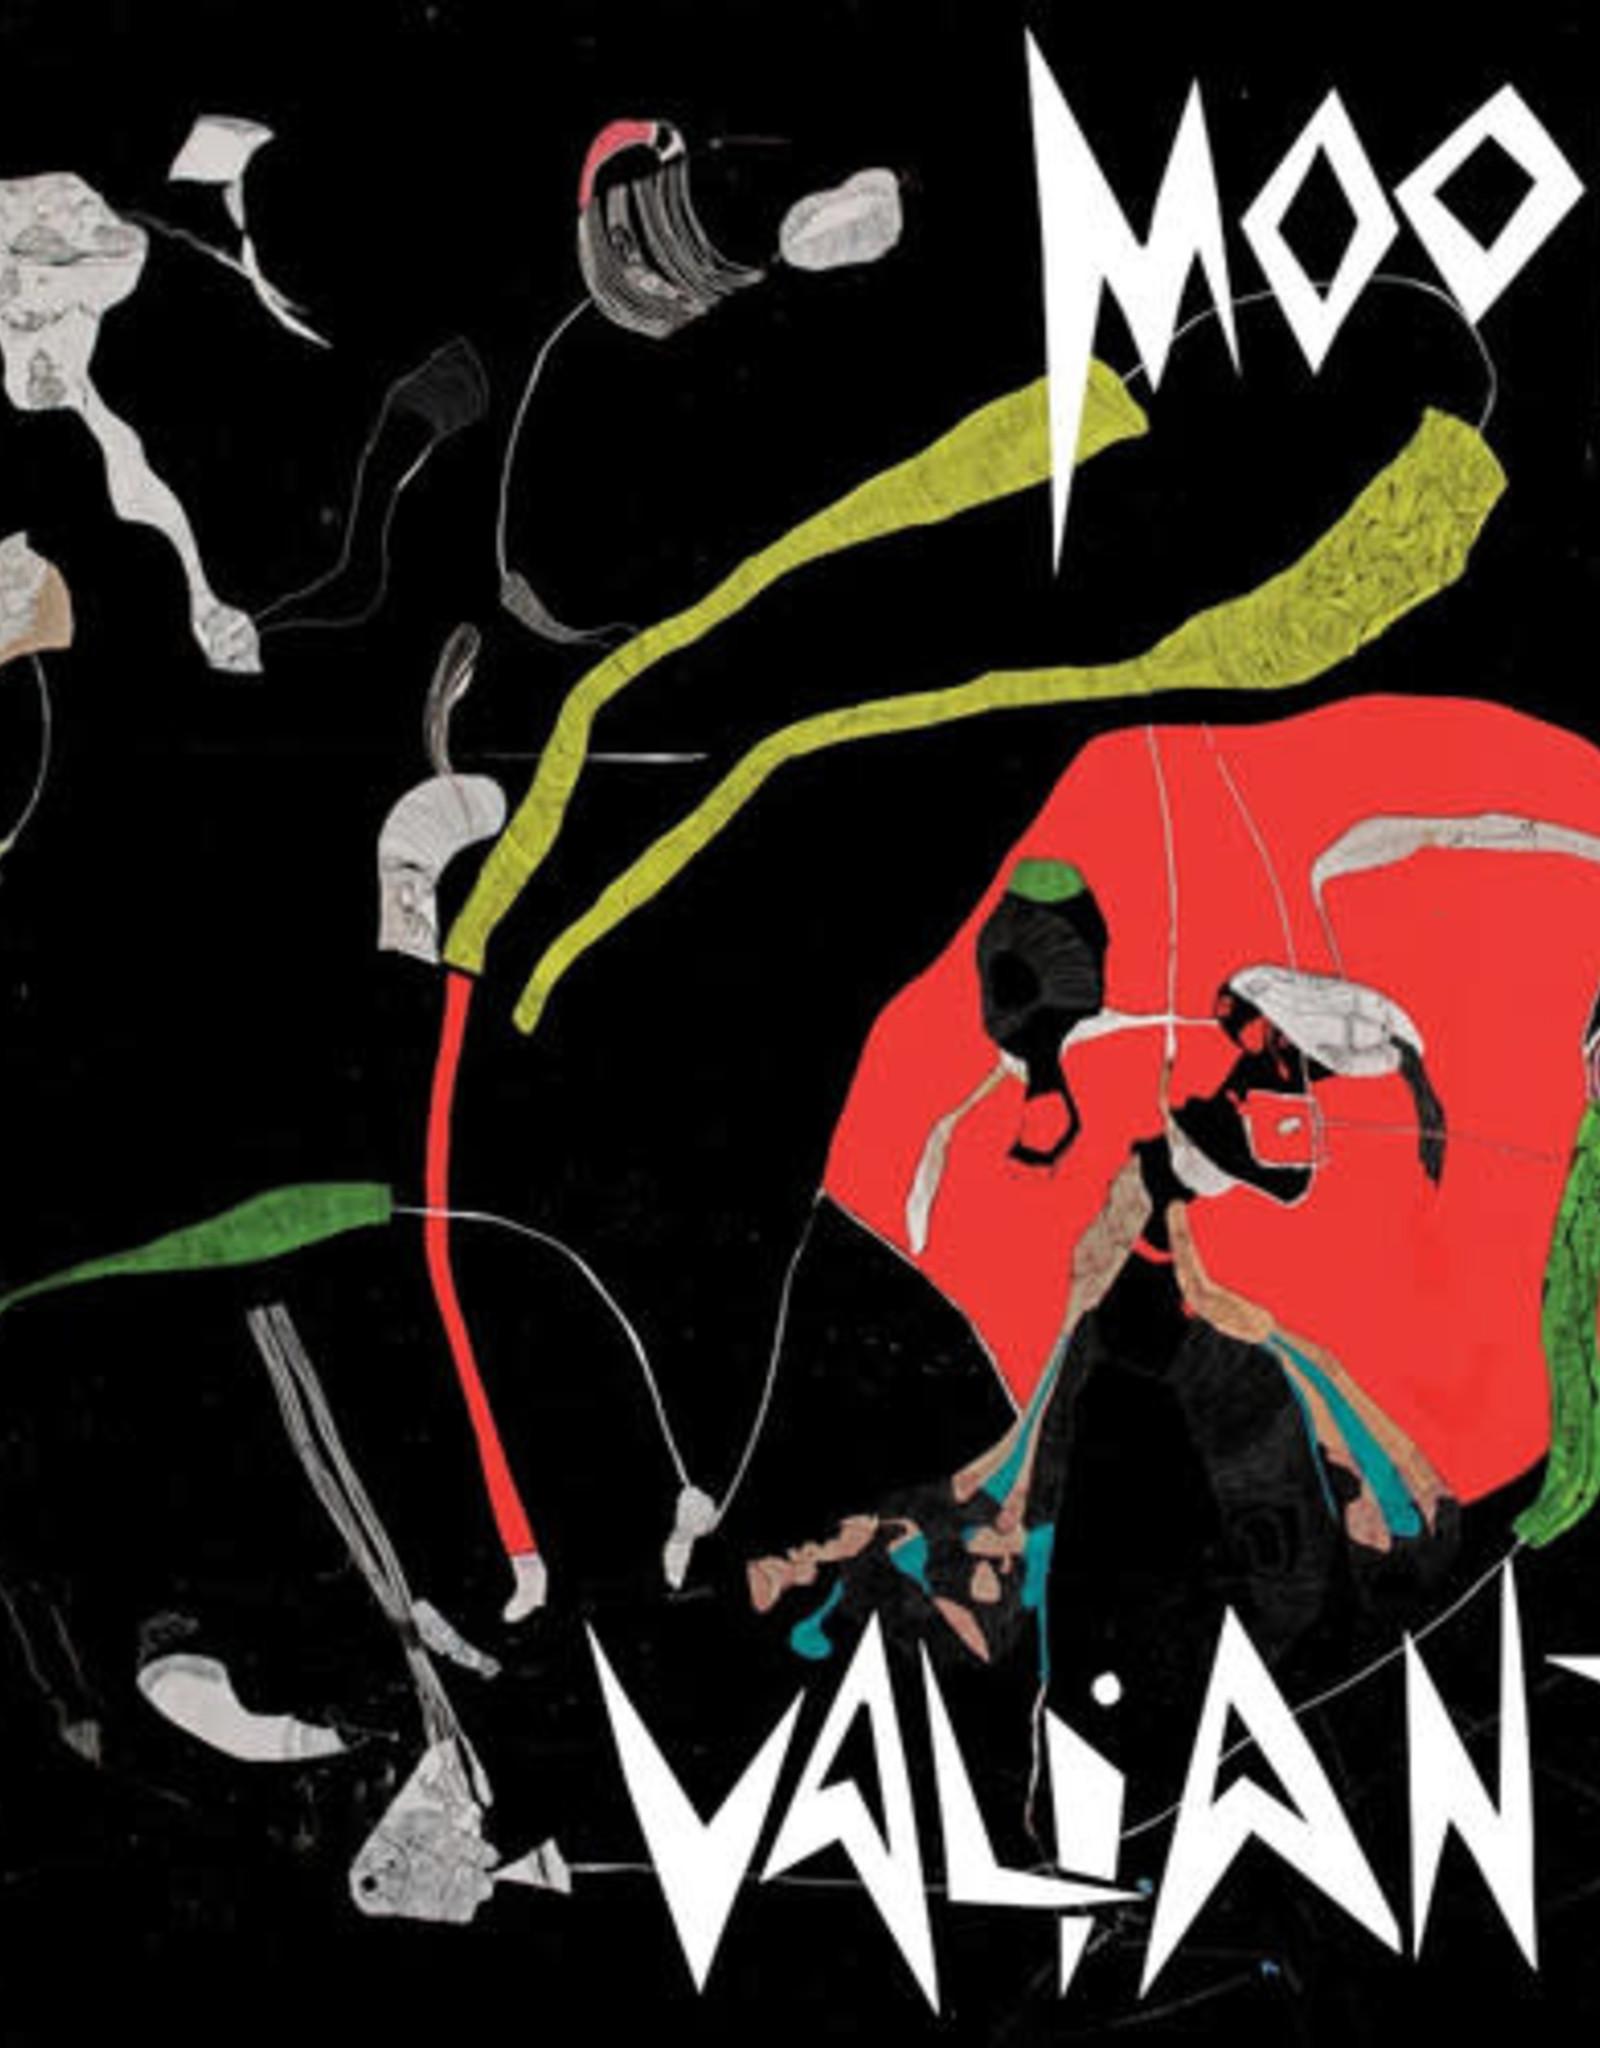 Hiatus Kaiyote - Mood Valiant (Red & Black Vinyl)